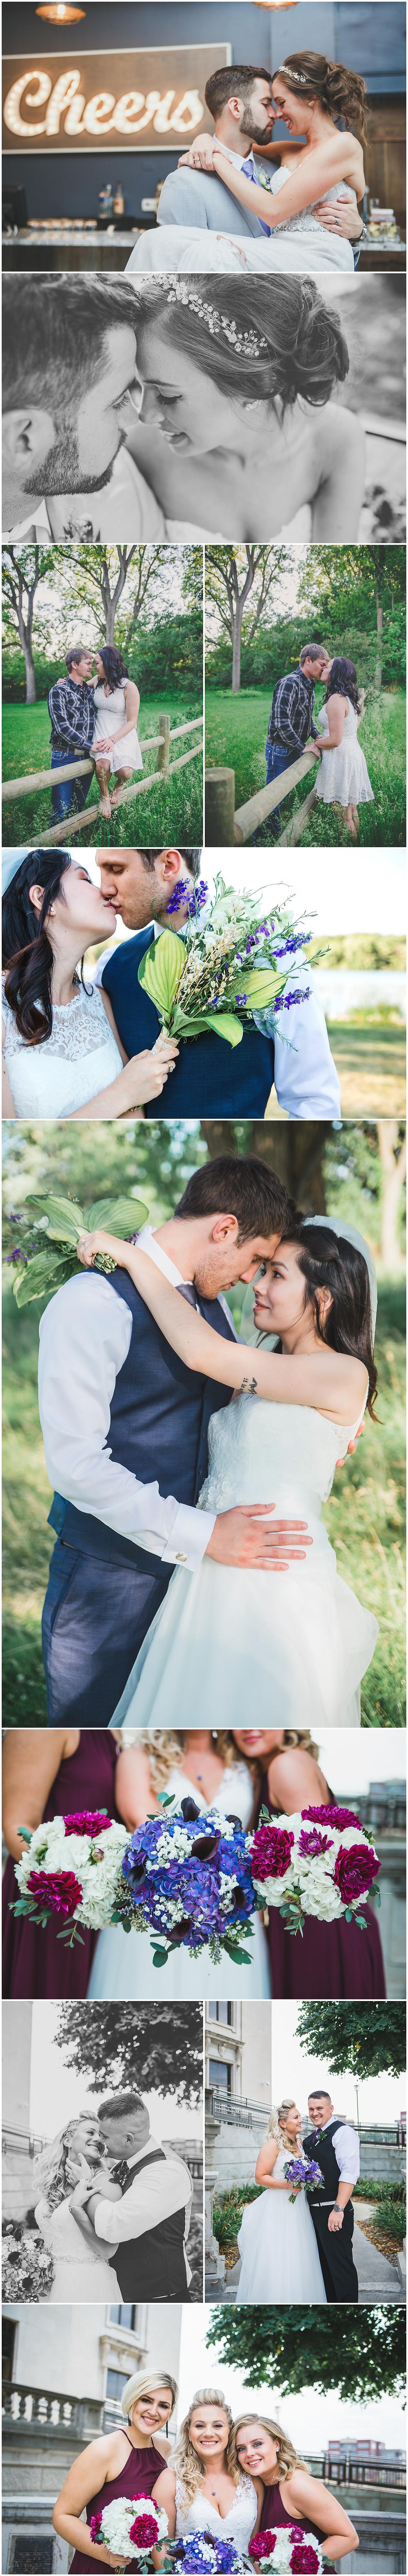 Iowa City Wedding Photography